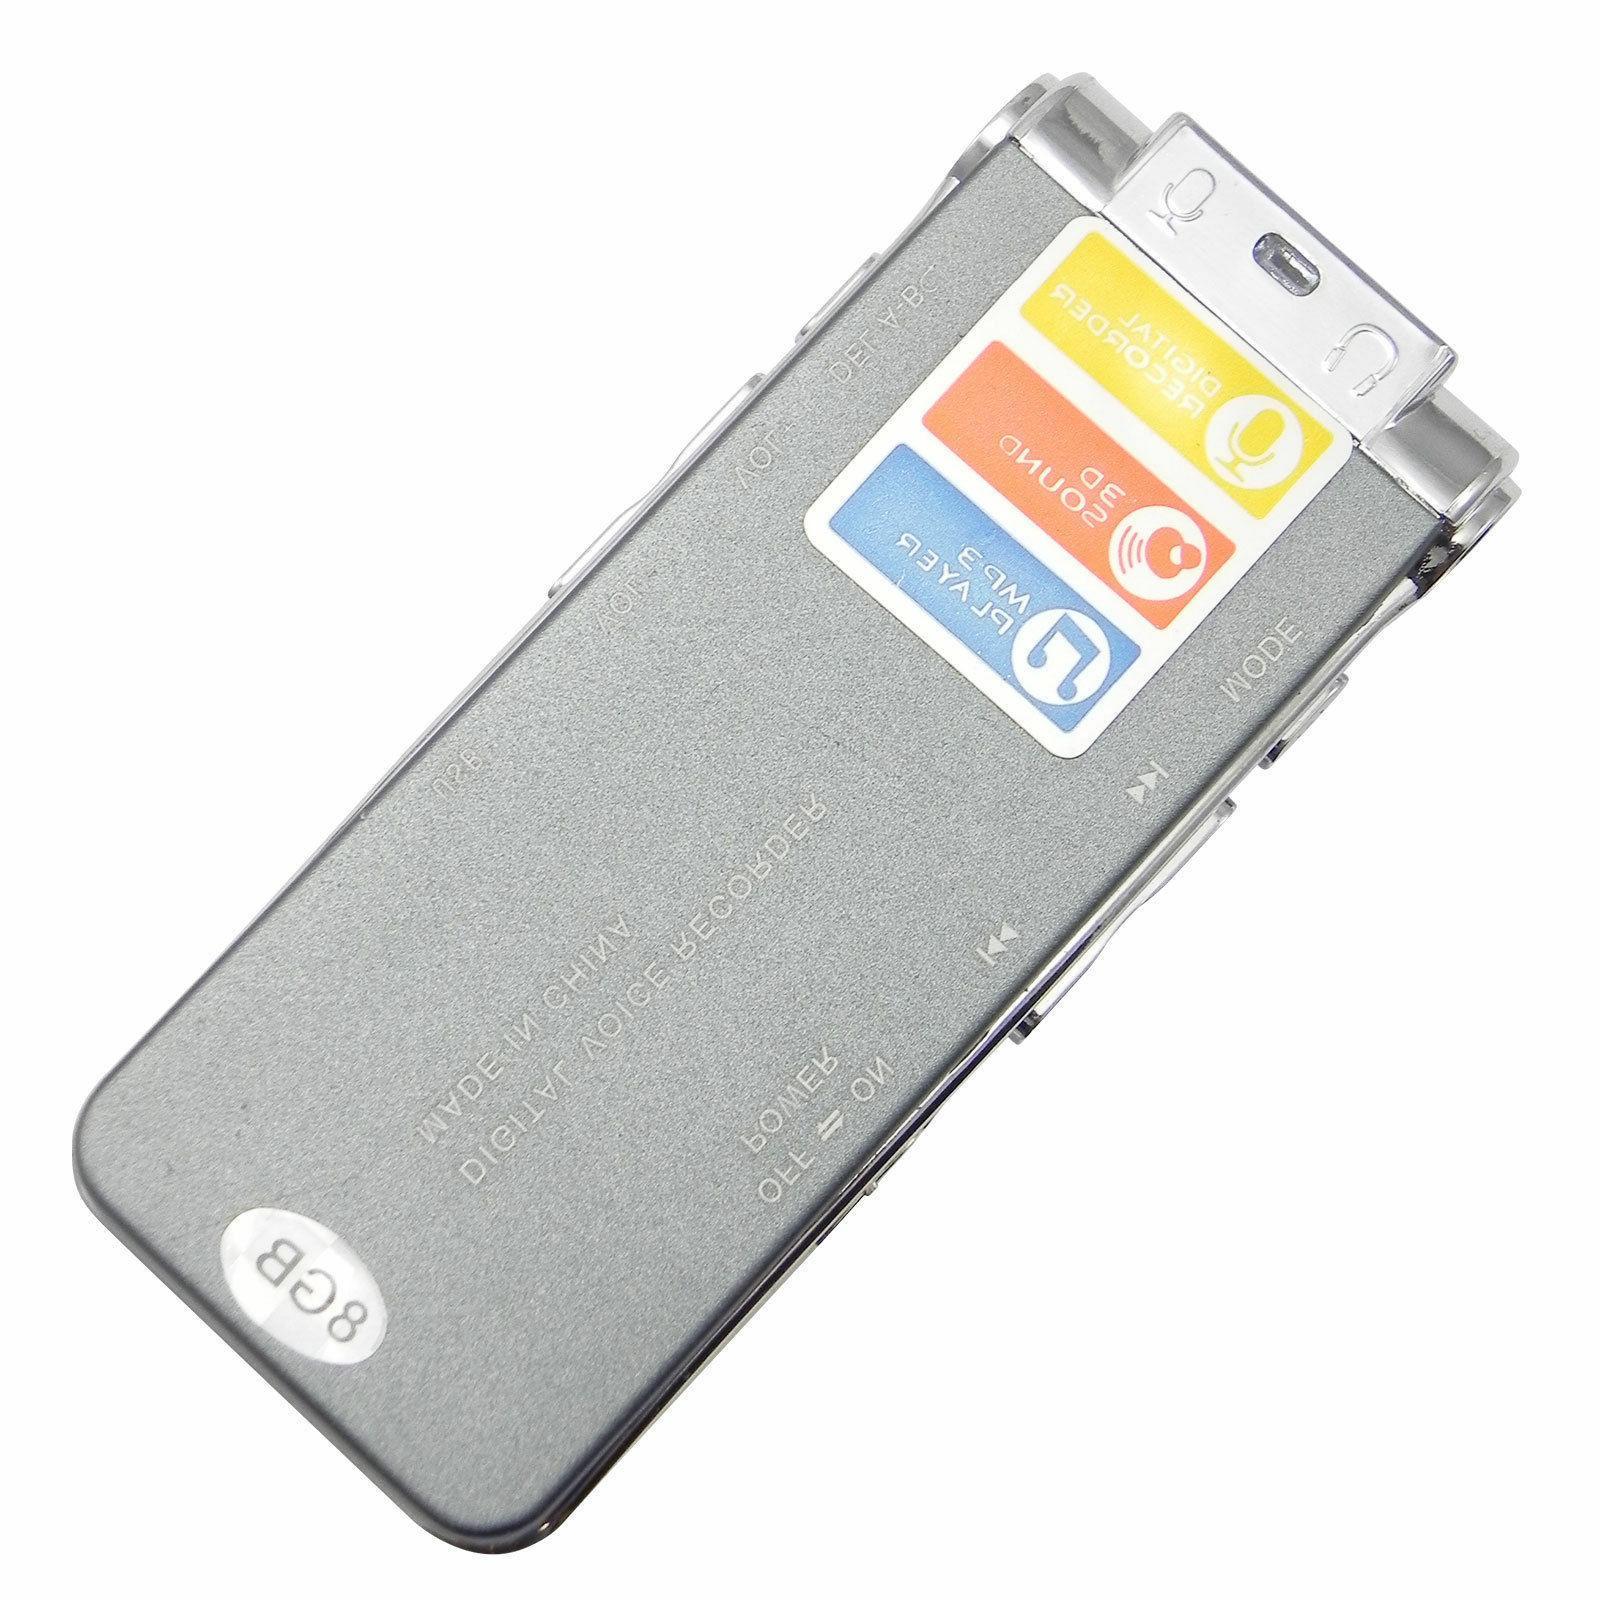 Voice Mini Spy 8GB Sound Recorder Dictaphone MP3 Player